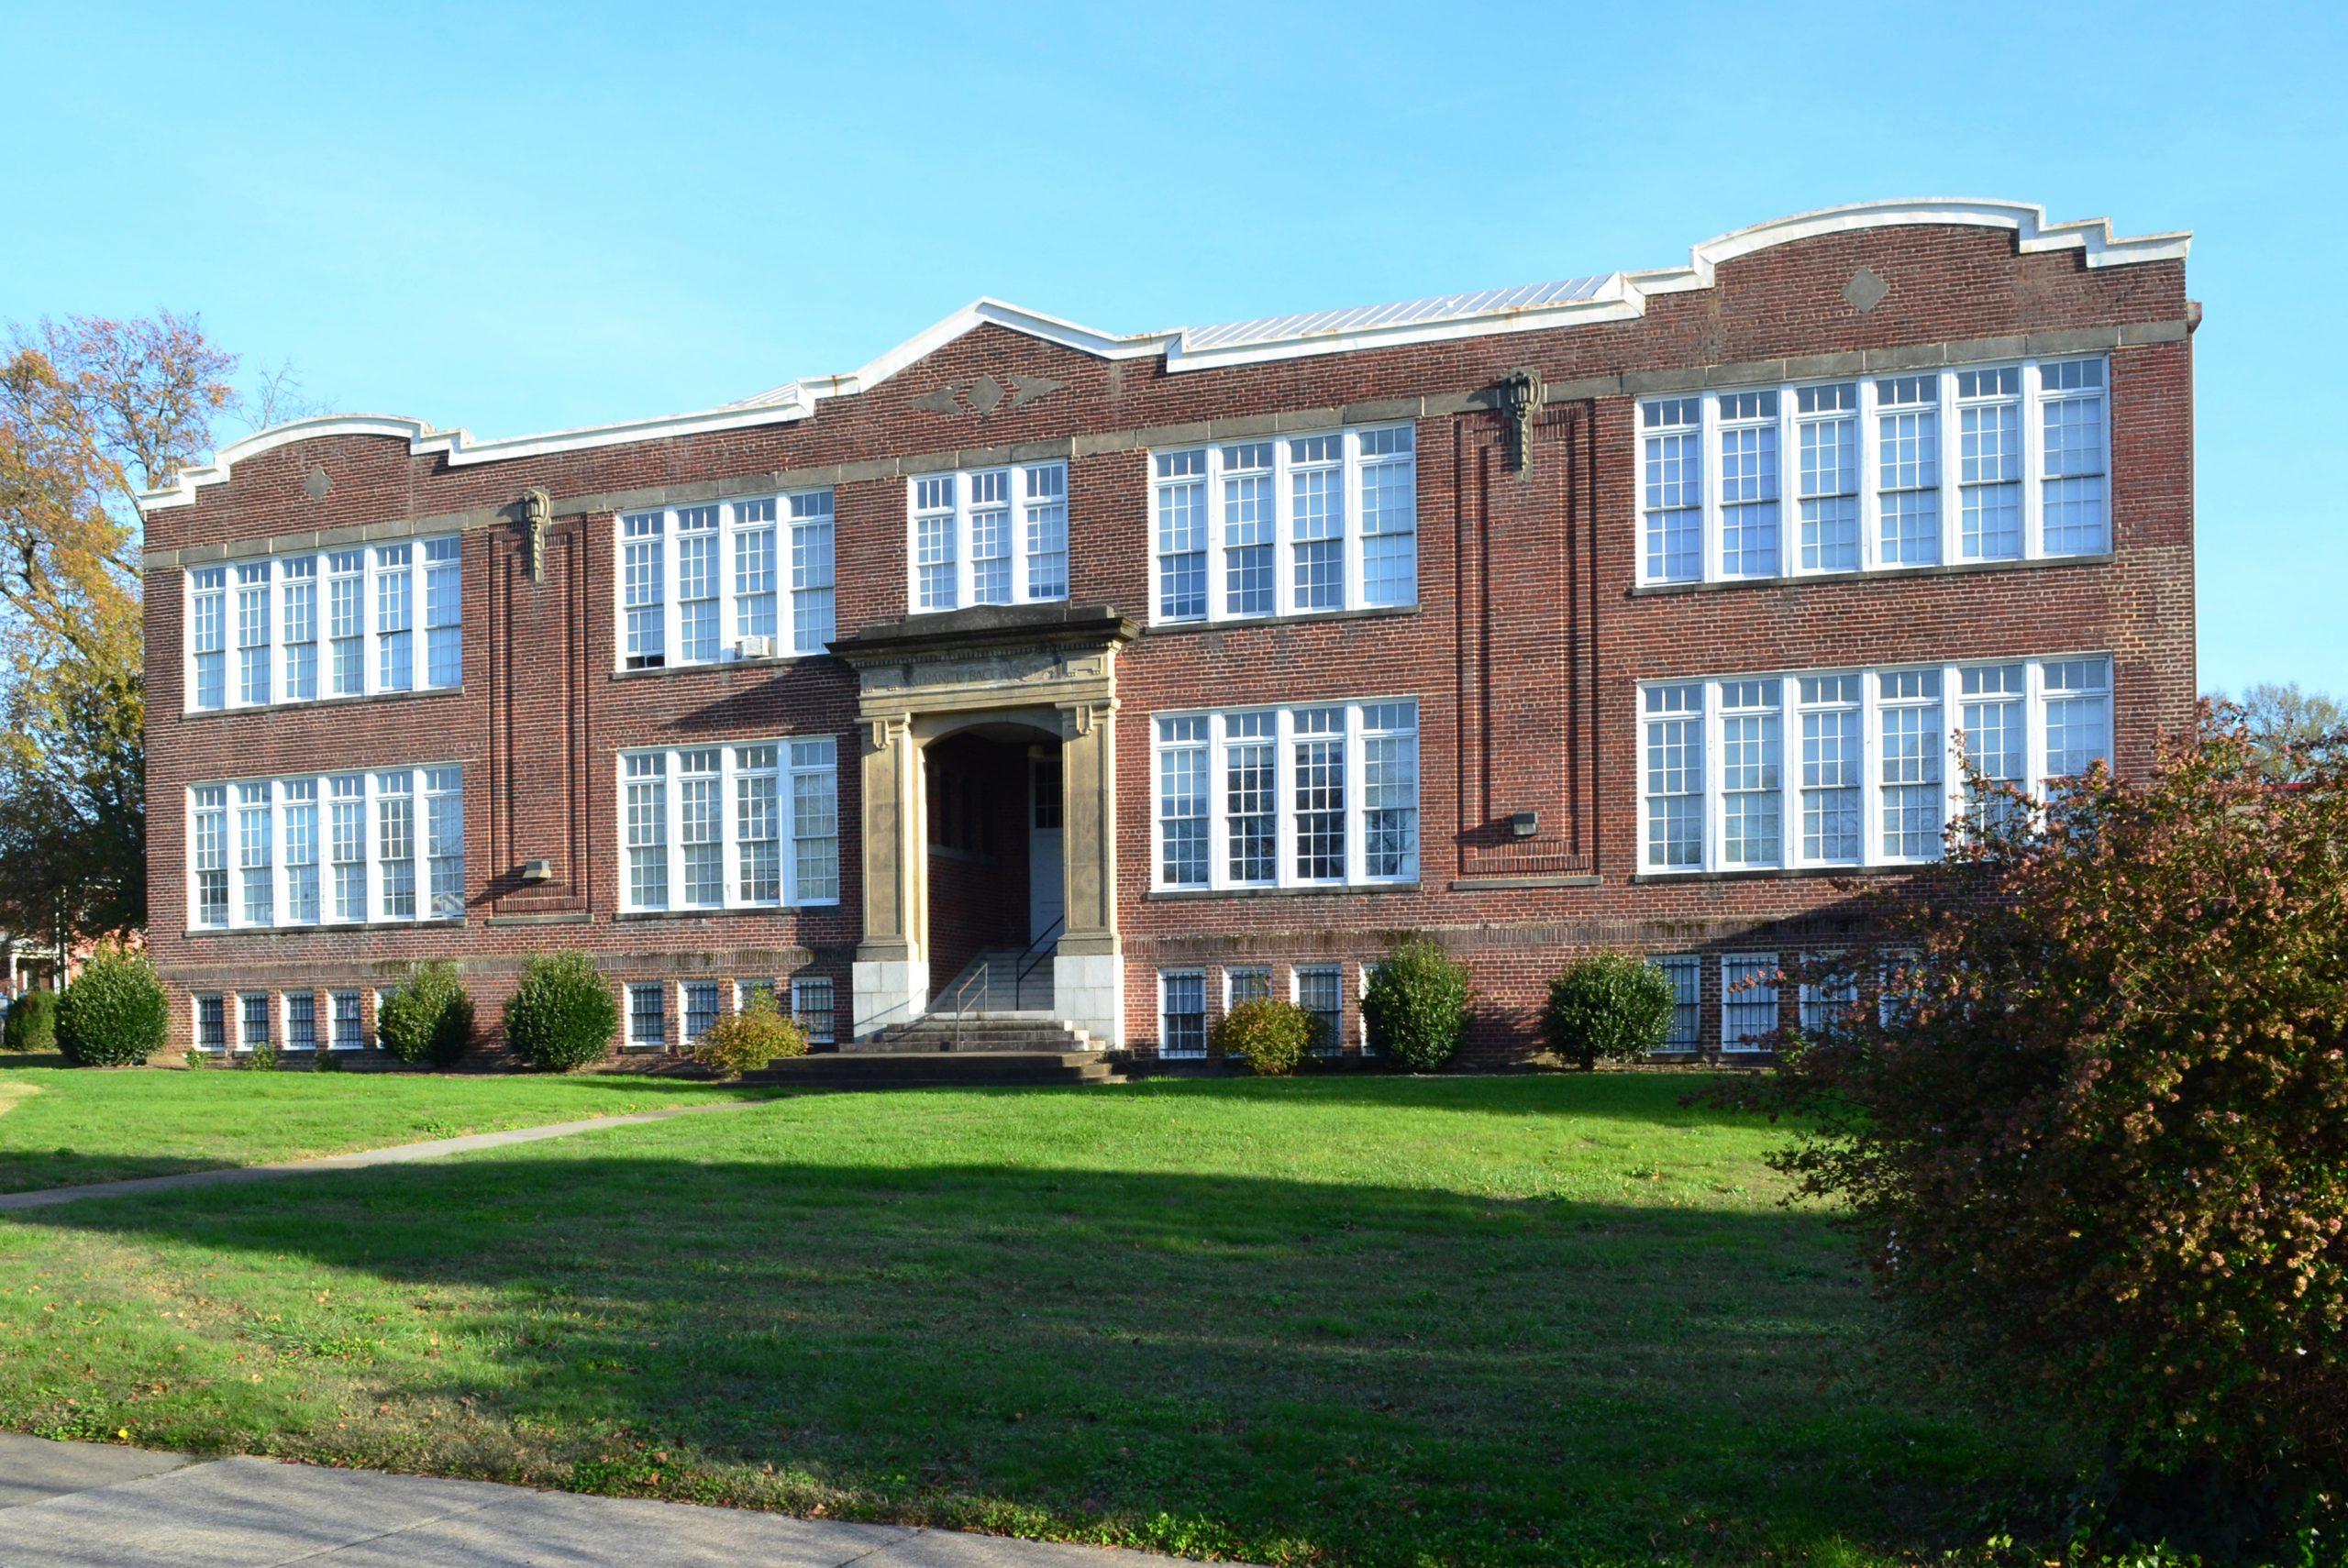 Nathaniel Bacon School